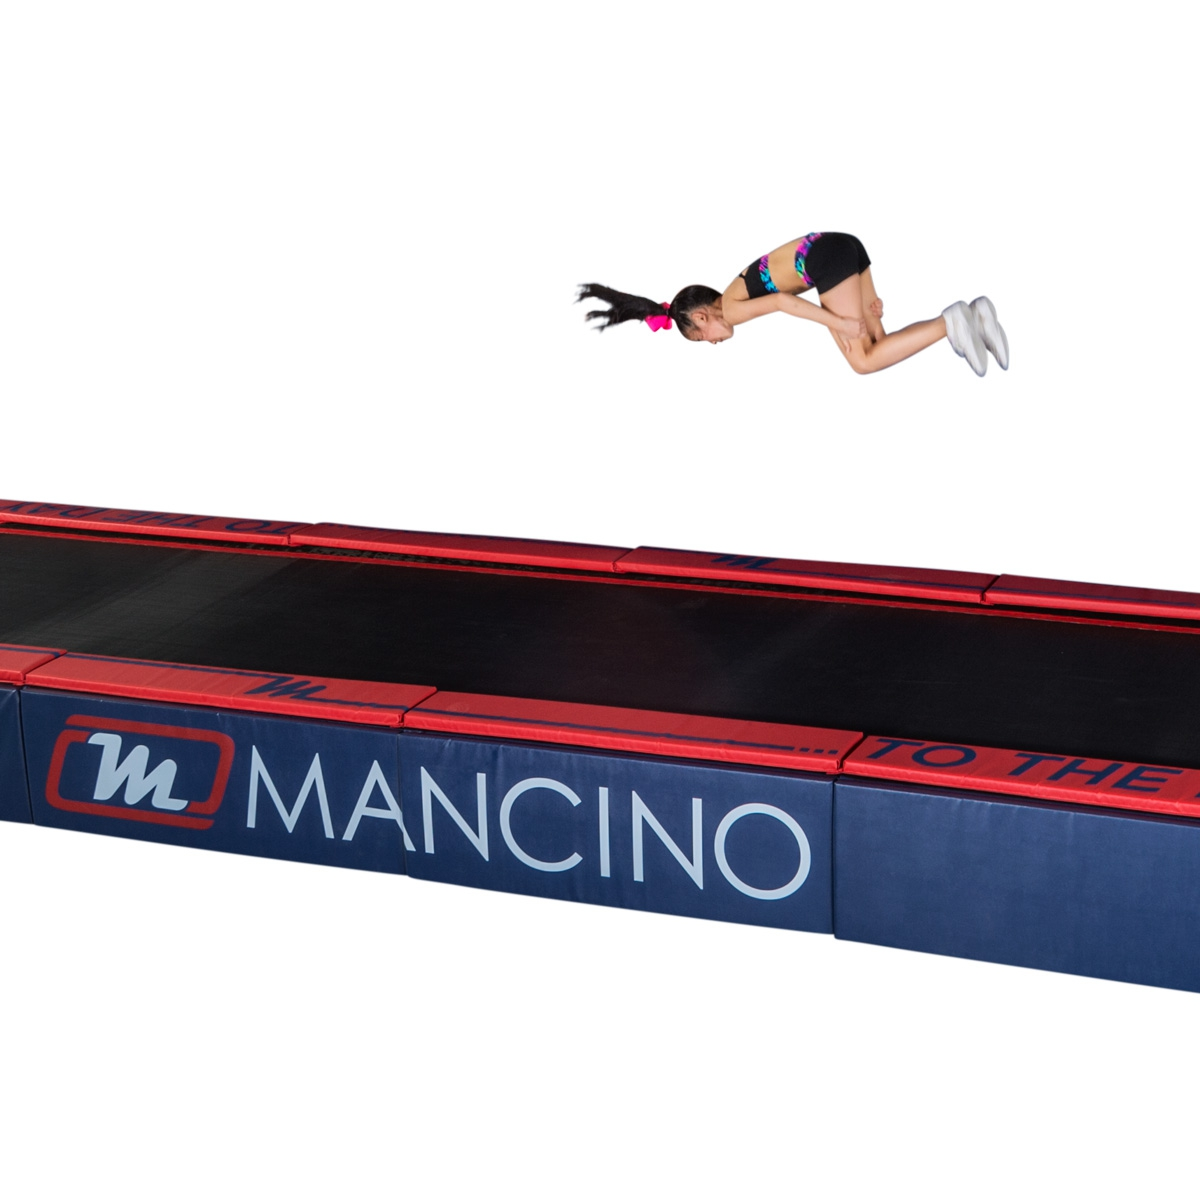 Mancino Mats top pads for cheer tumbl trak